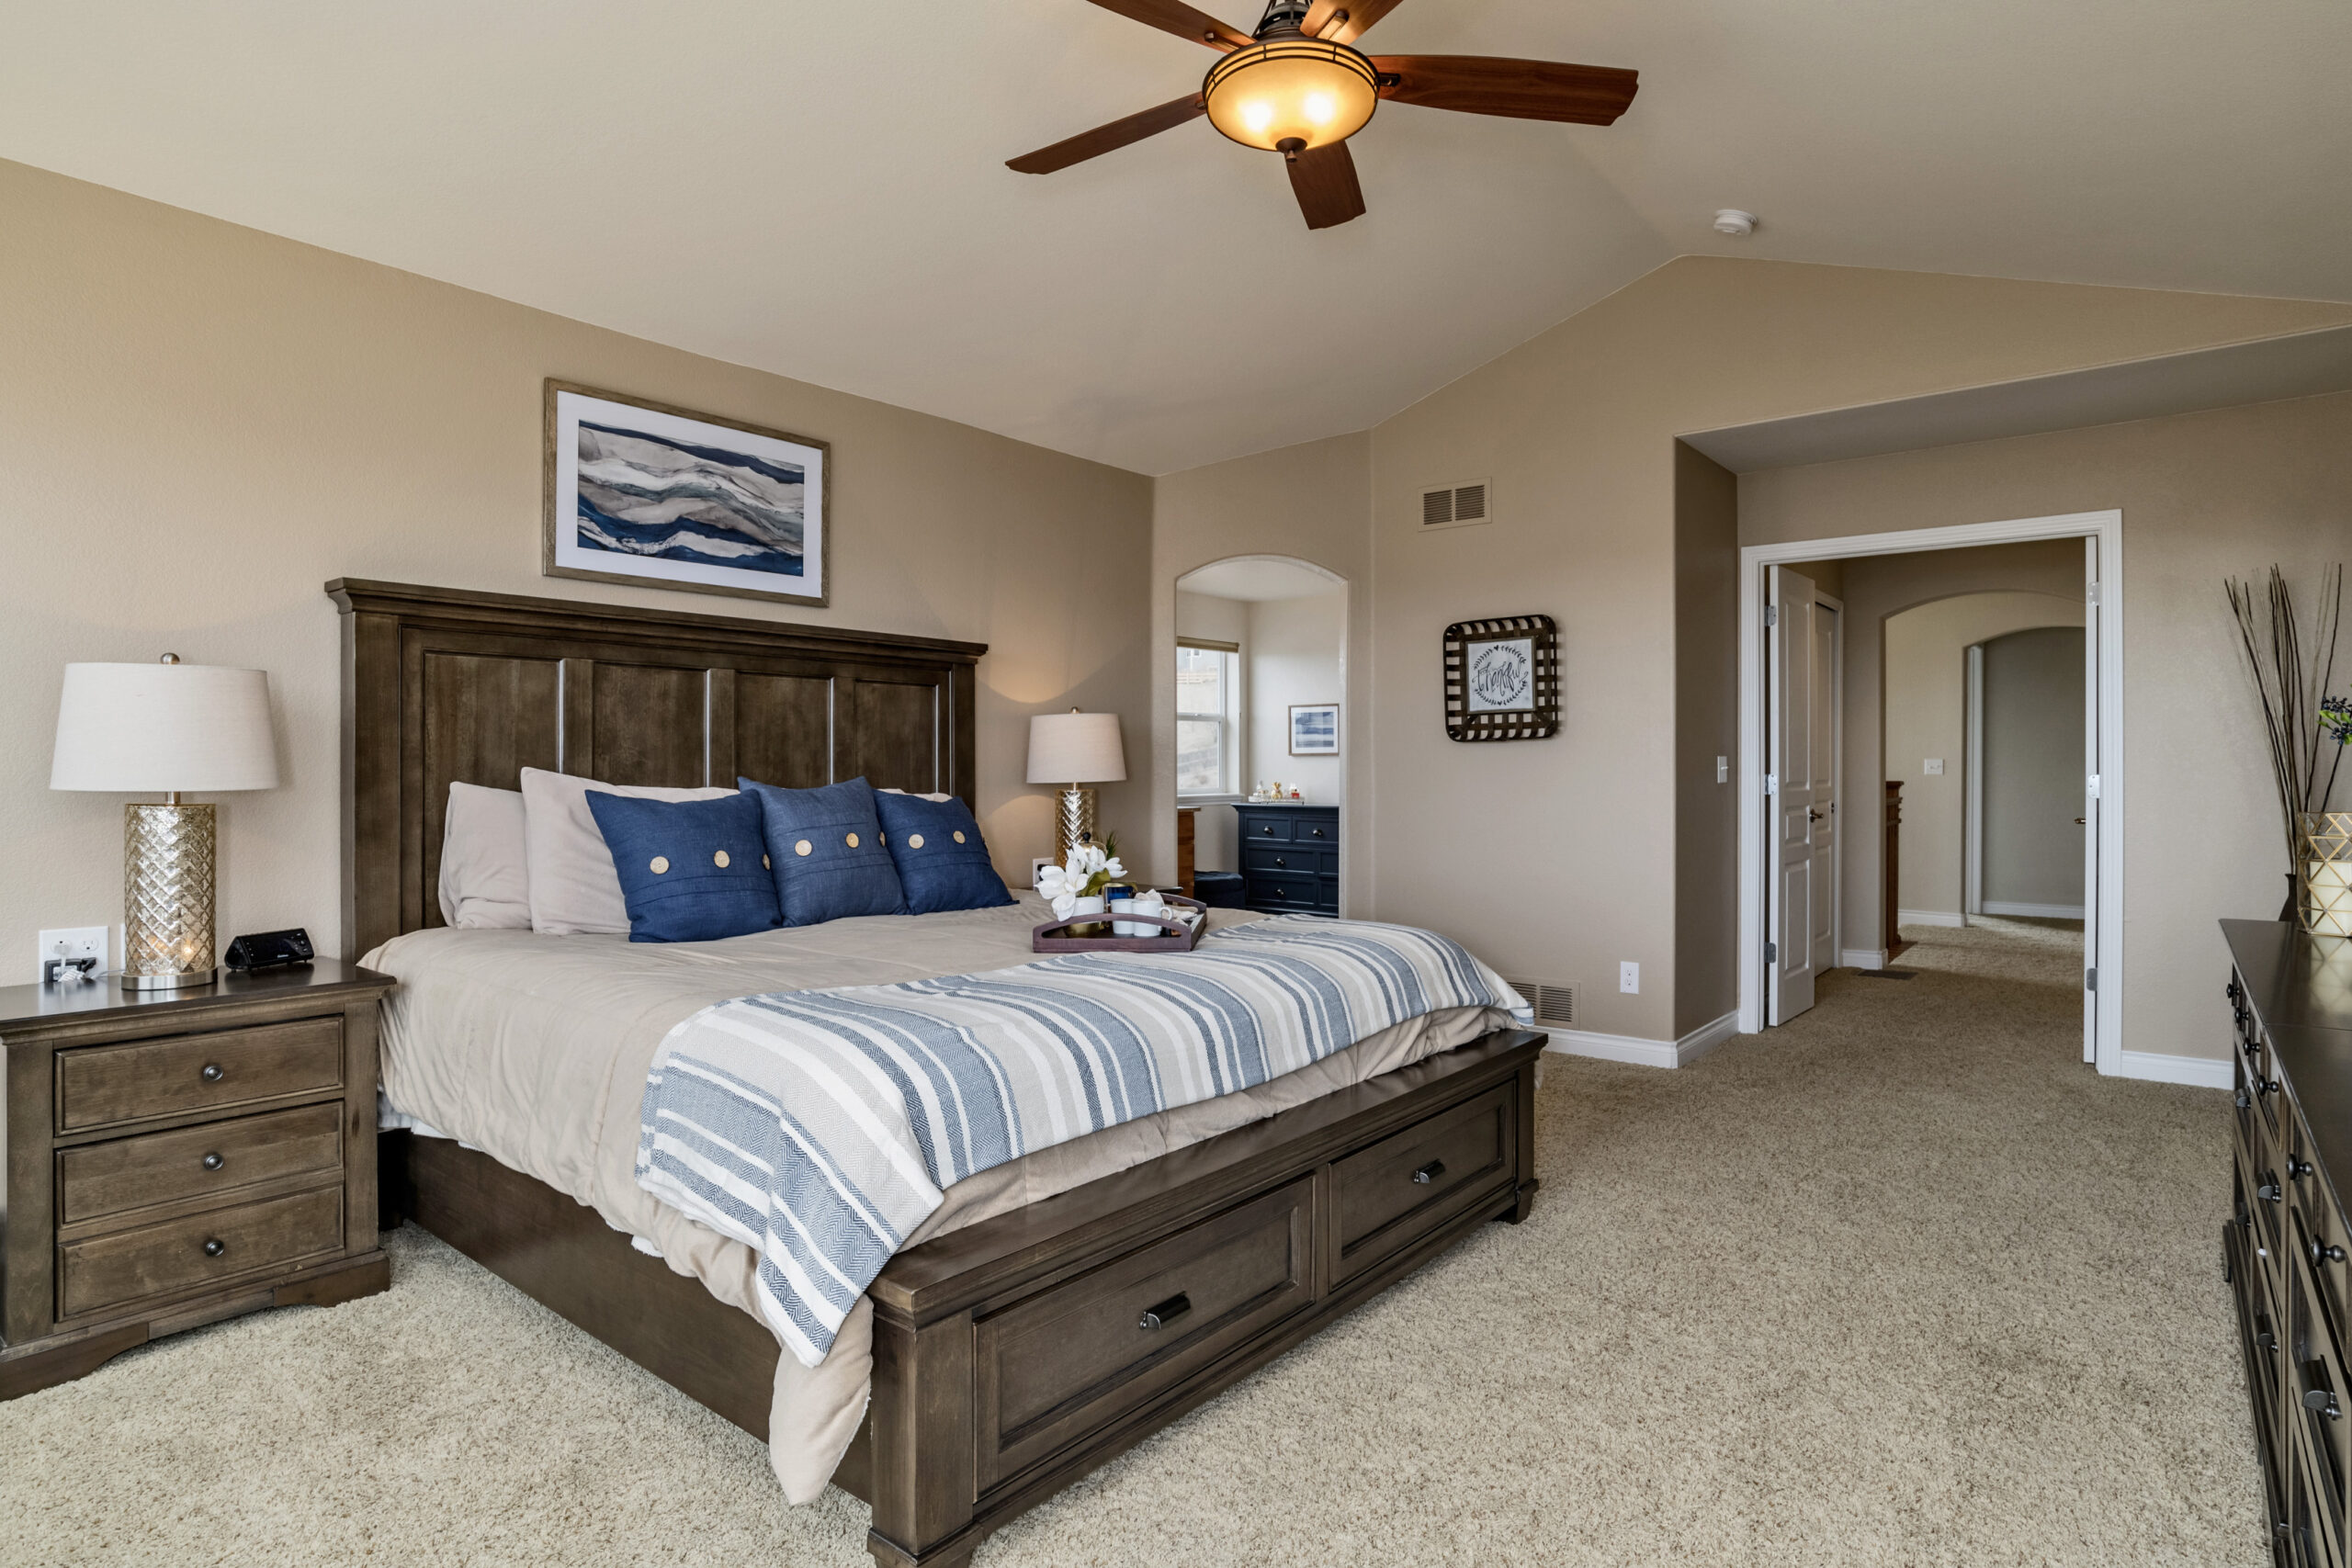 Bedroom Home staging